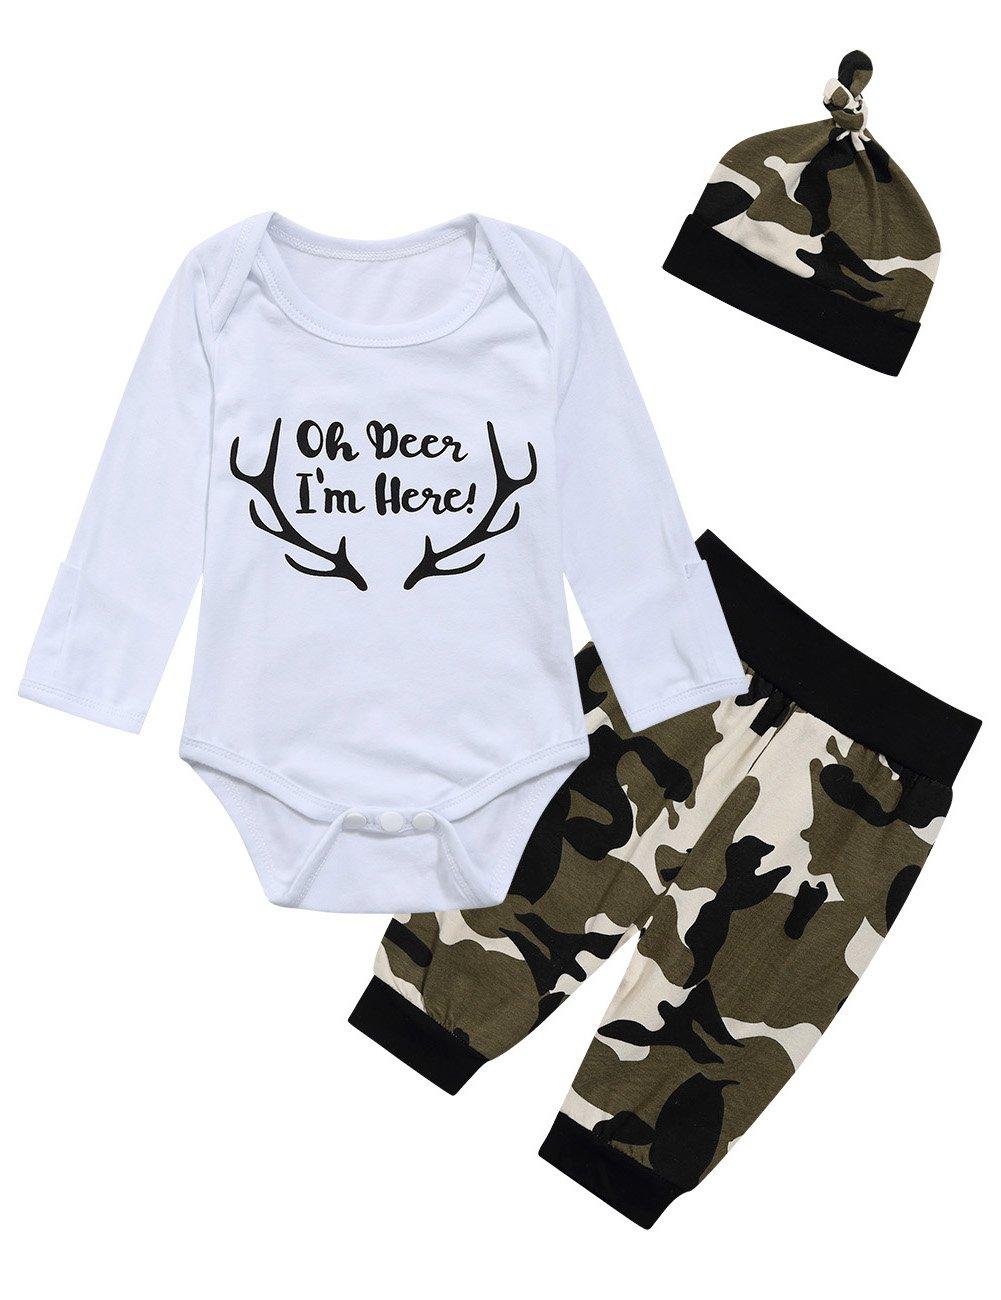 Oh Deer Baby Boys Bodysuit Tops Camouflage Pants Hat 3PCS Outfit Set